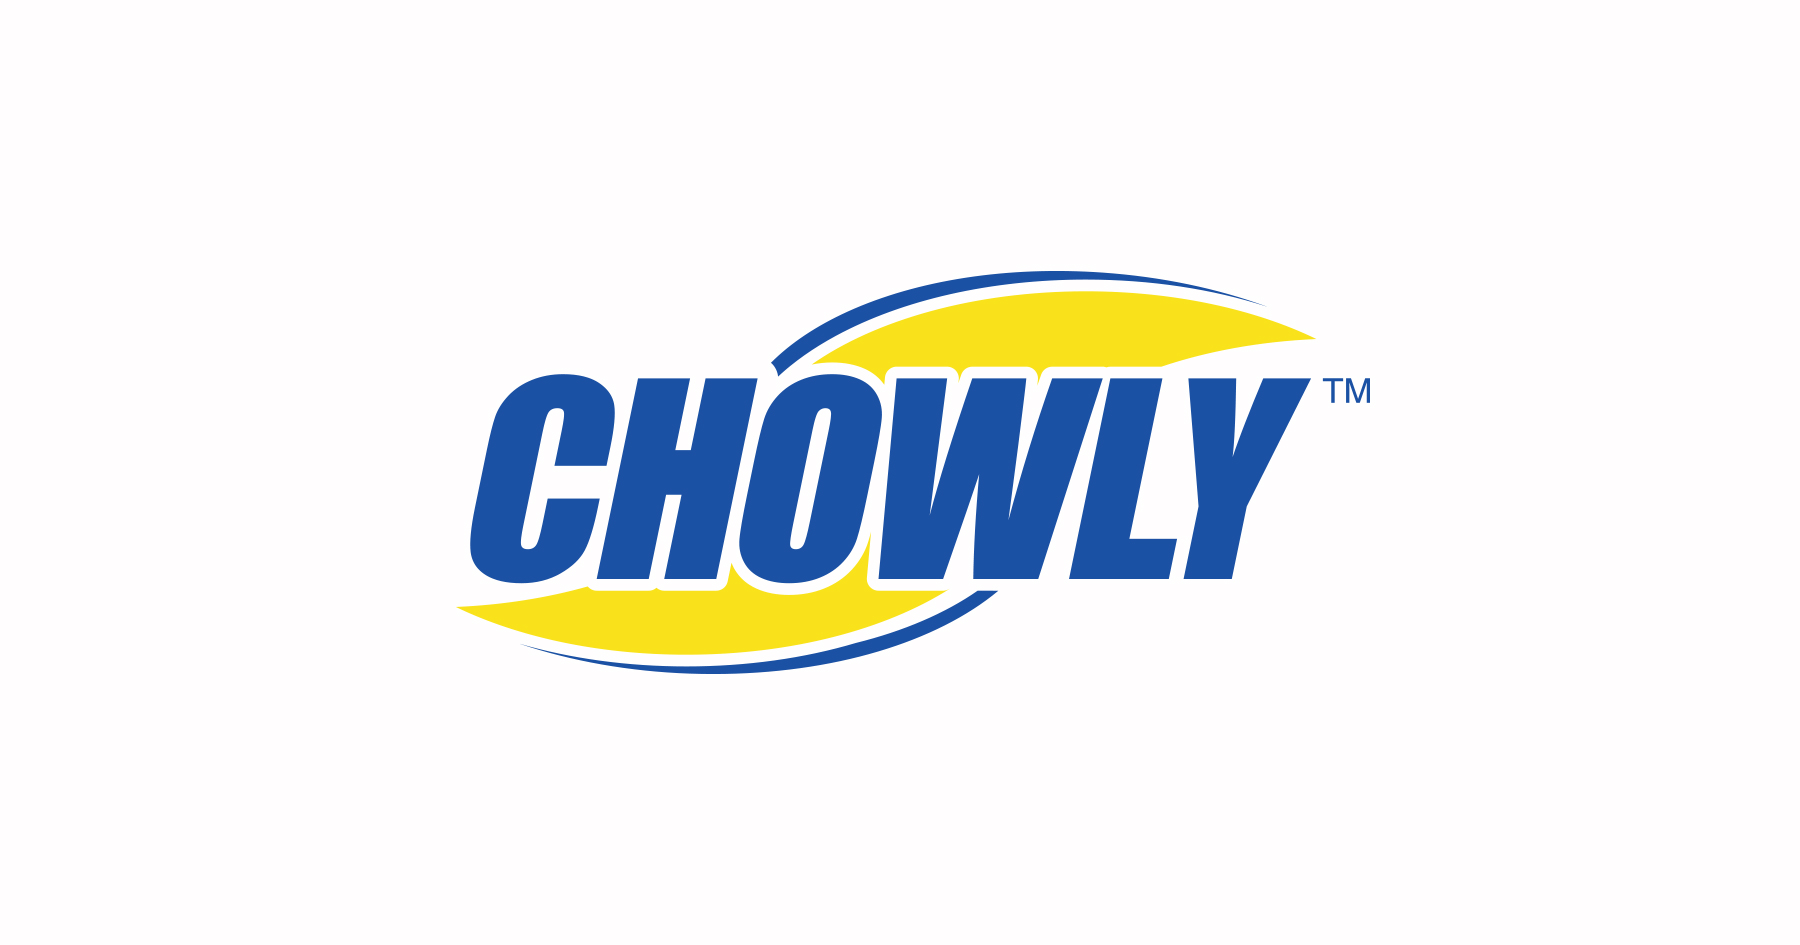 Chowly Fstec